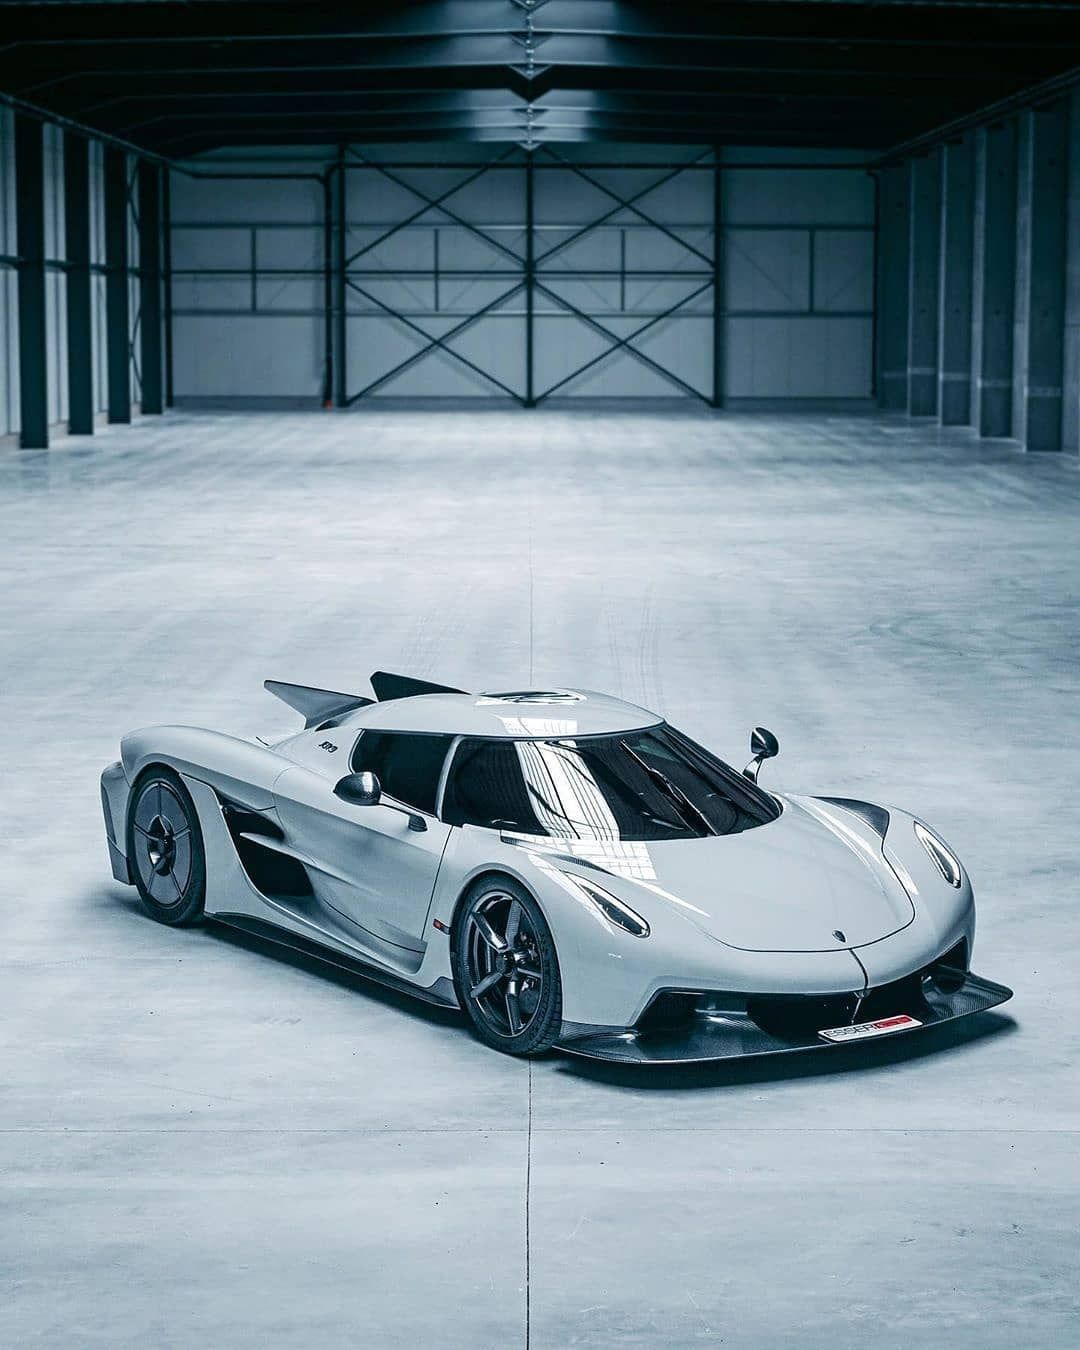 Koenigsegg Jesko Absolut Koenigsegg Super Cars Best Luxury Cars